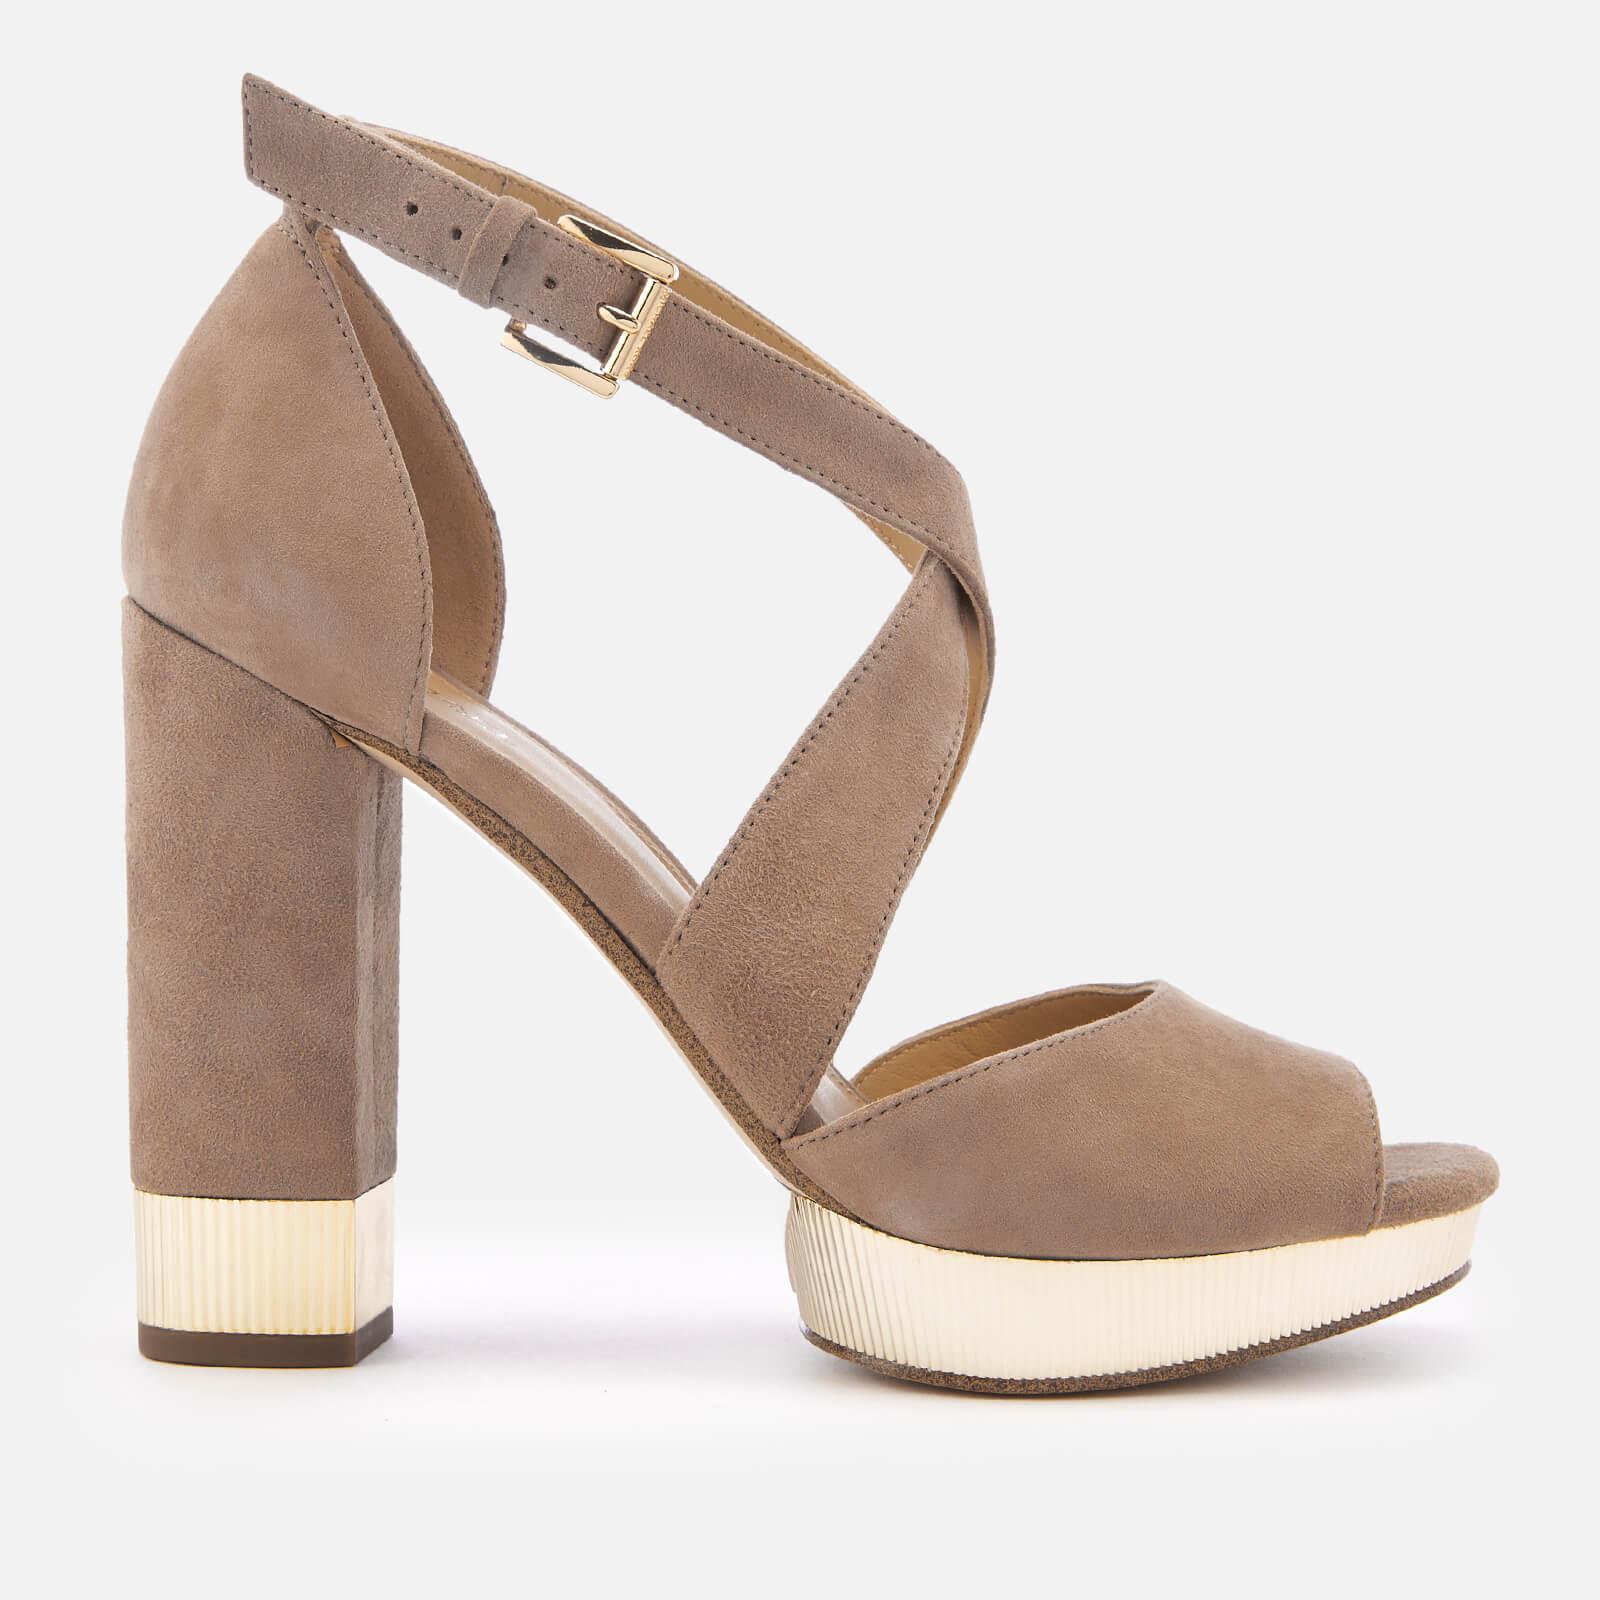 MICHAEL MICHAEL KORS Women's Valerie Platform Heeled Sandals - Dark Khaki - UK 7/US 10 - Beige